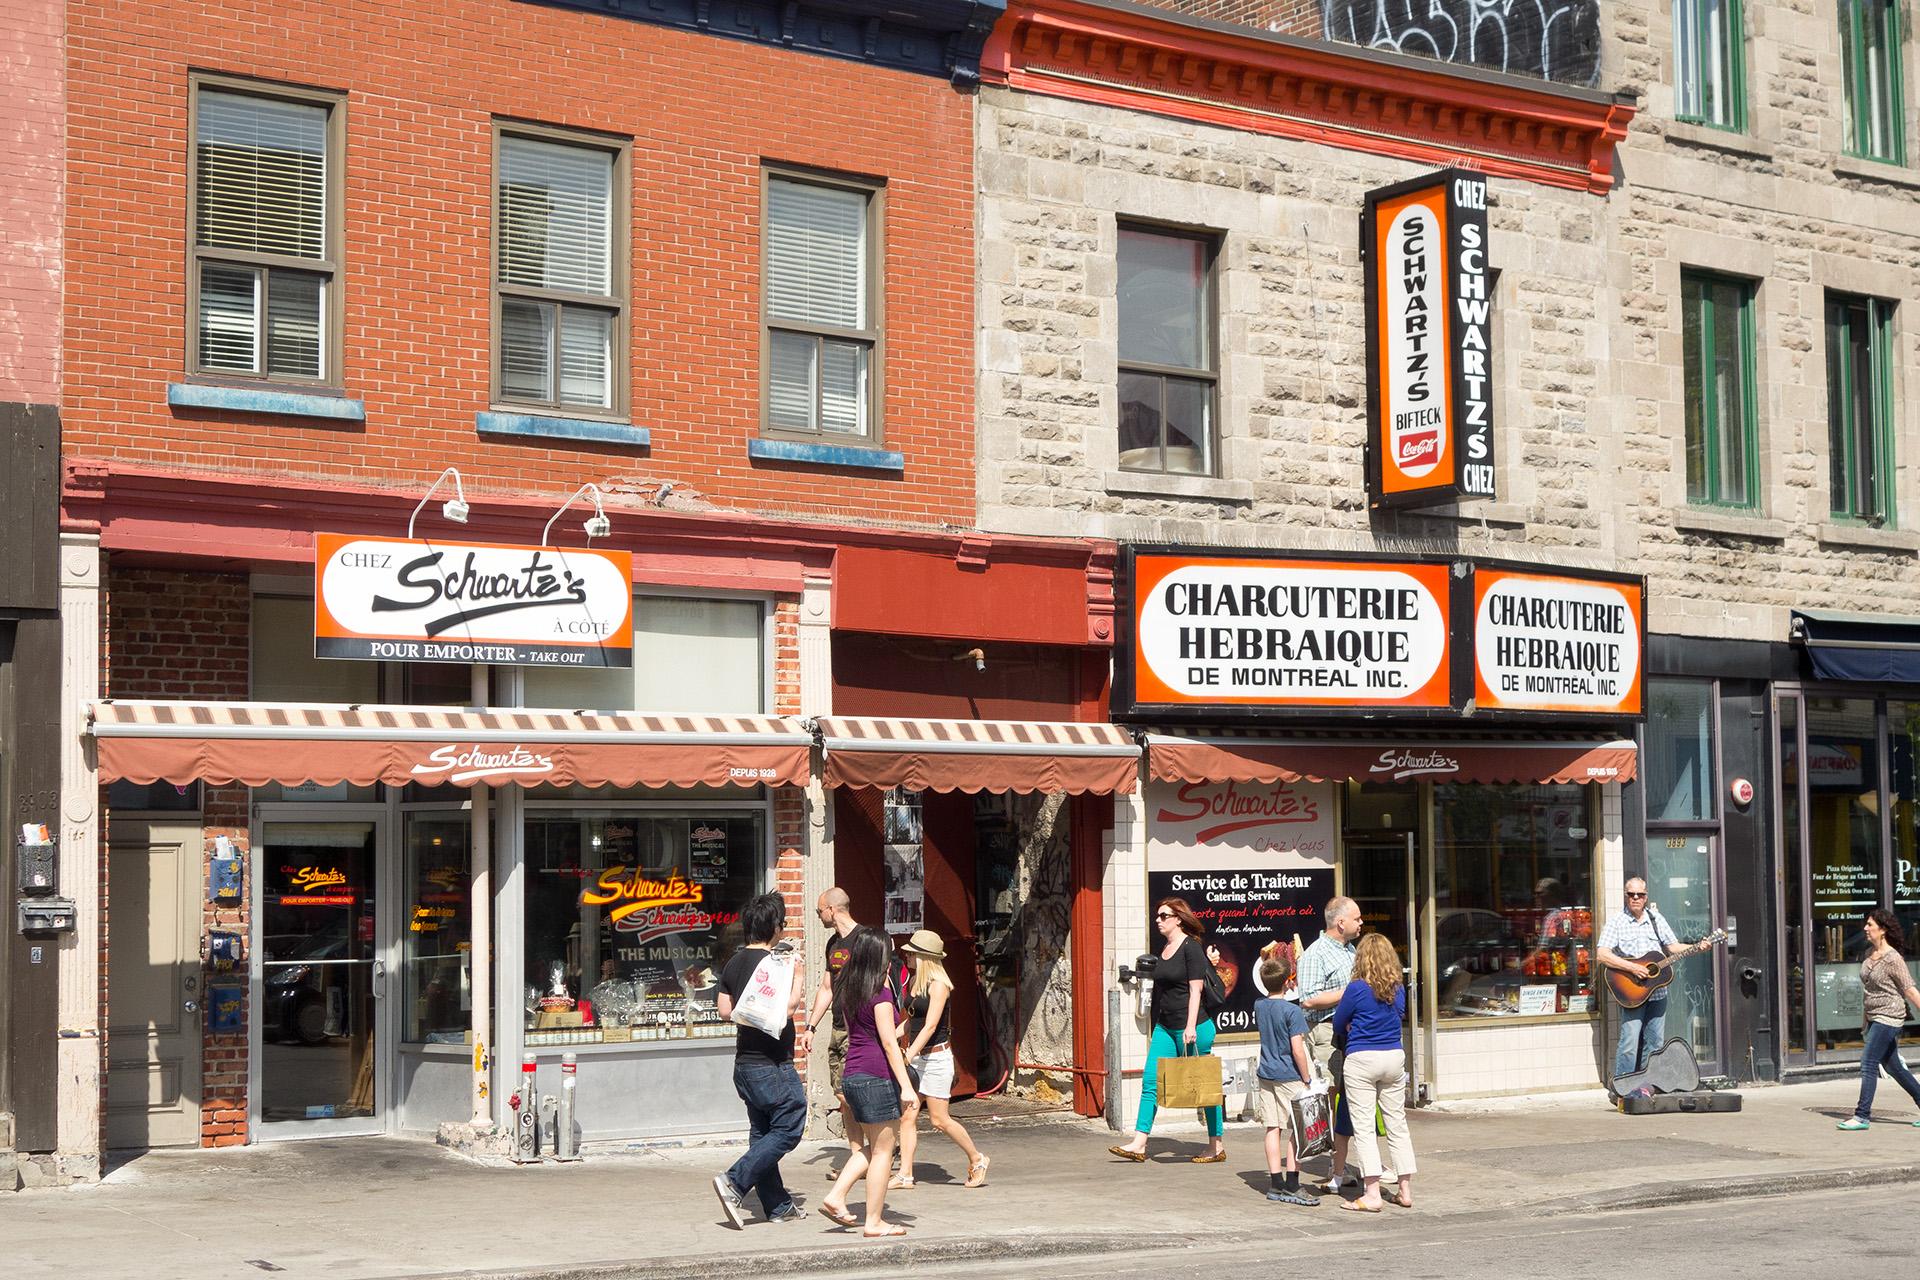 Schwartz's Deli storefront.